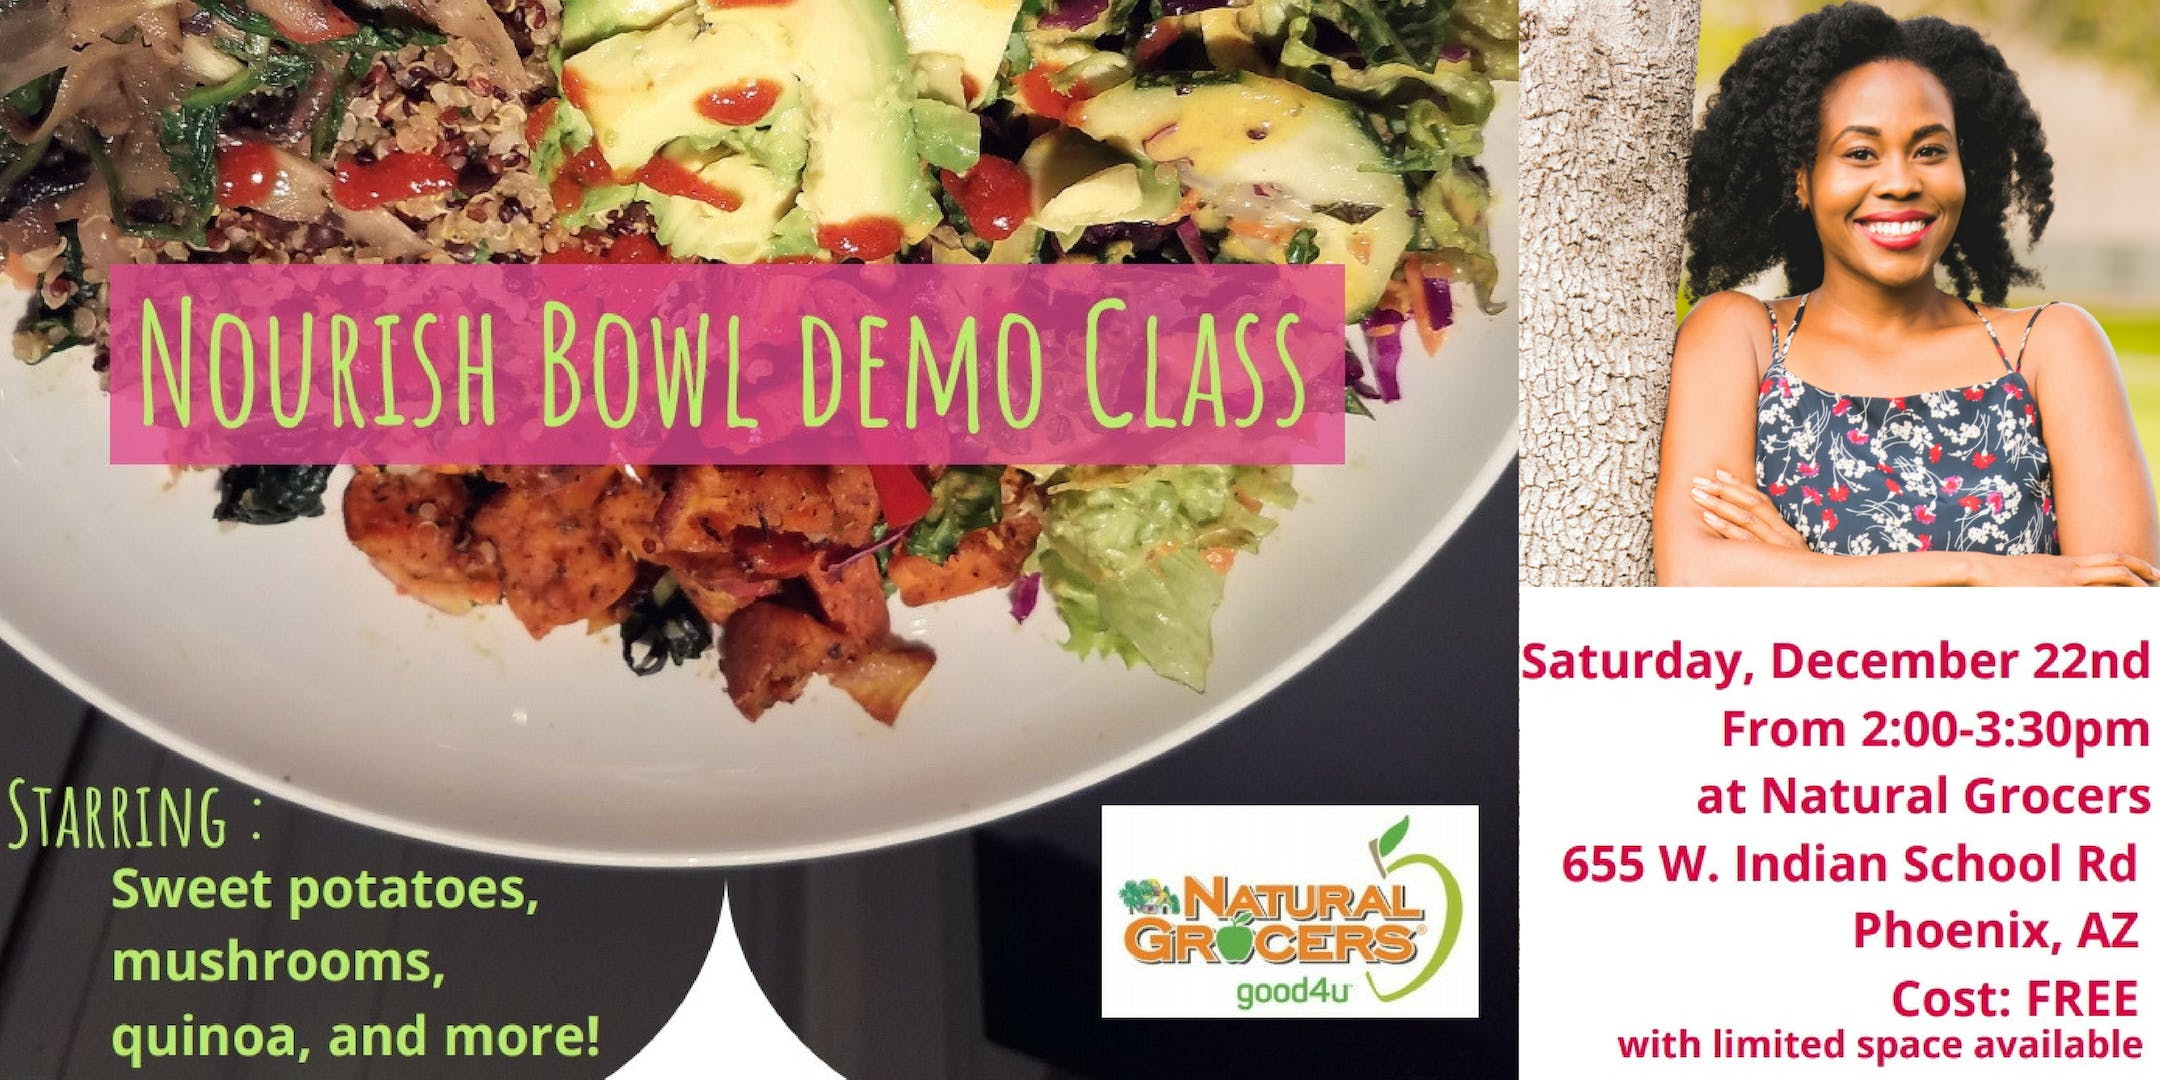 Nourish Bowl Demo Class